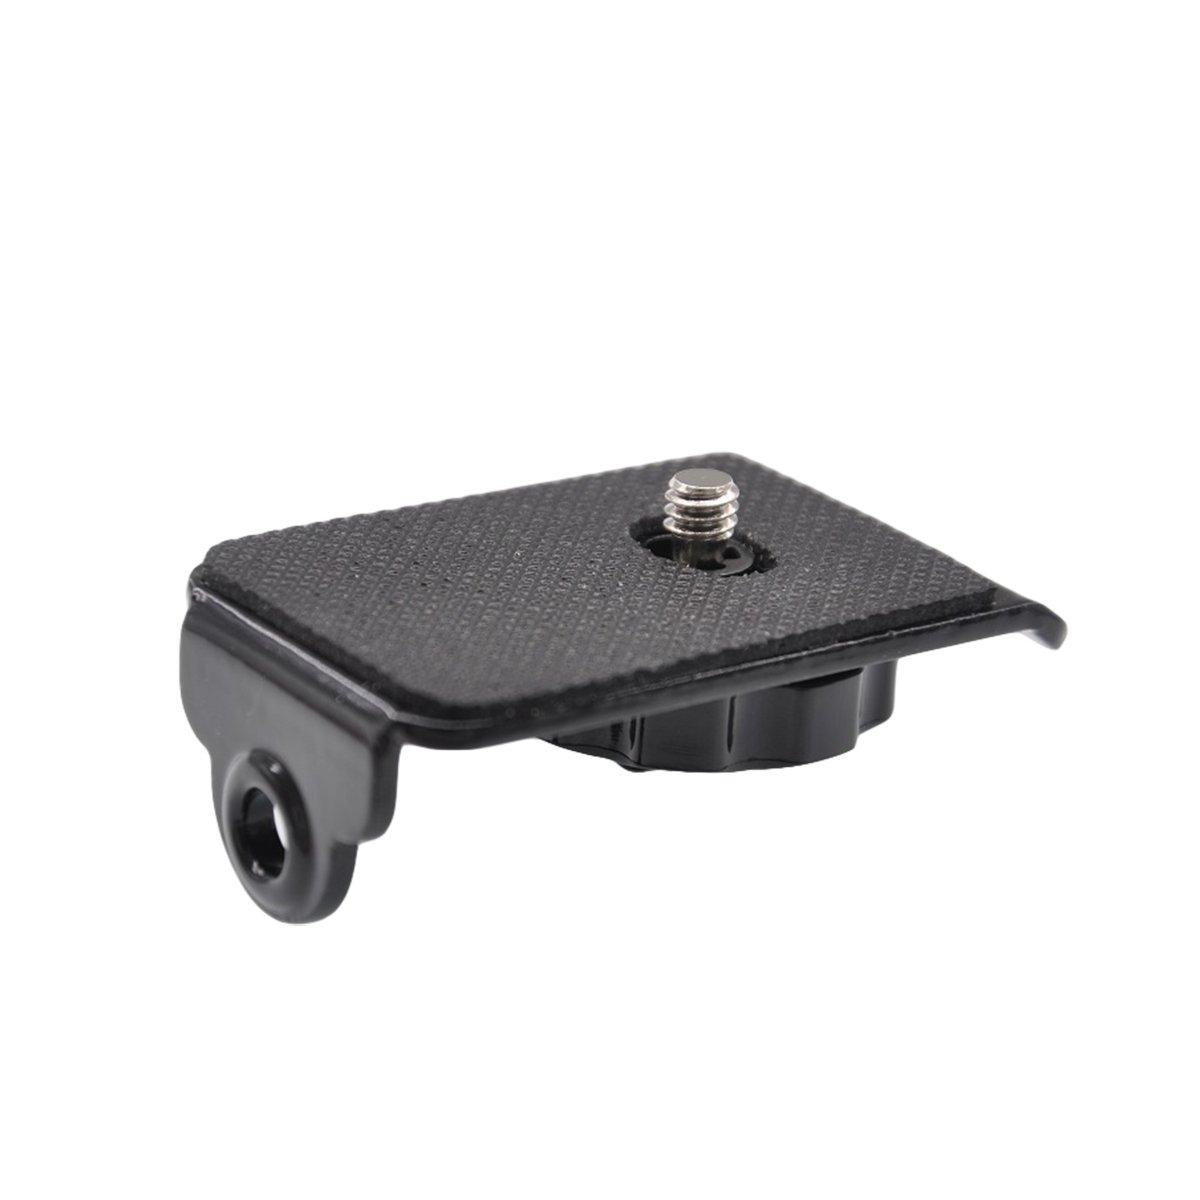 forapid 1ピースユニバーサルクイックリリースメタルマウントプレートとスクリュー三脚マウントすべてのDSLRカメラ迅速な肩首スリングネックストラップベルト(Canon Nikon Sony Olympus Pentax & More) B01K87U9J6